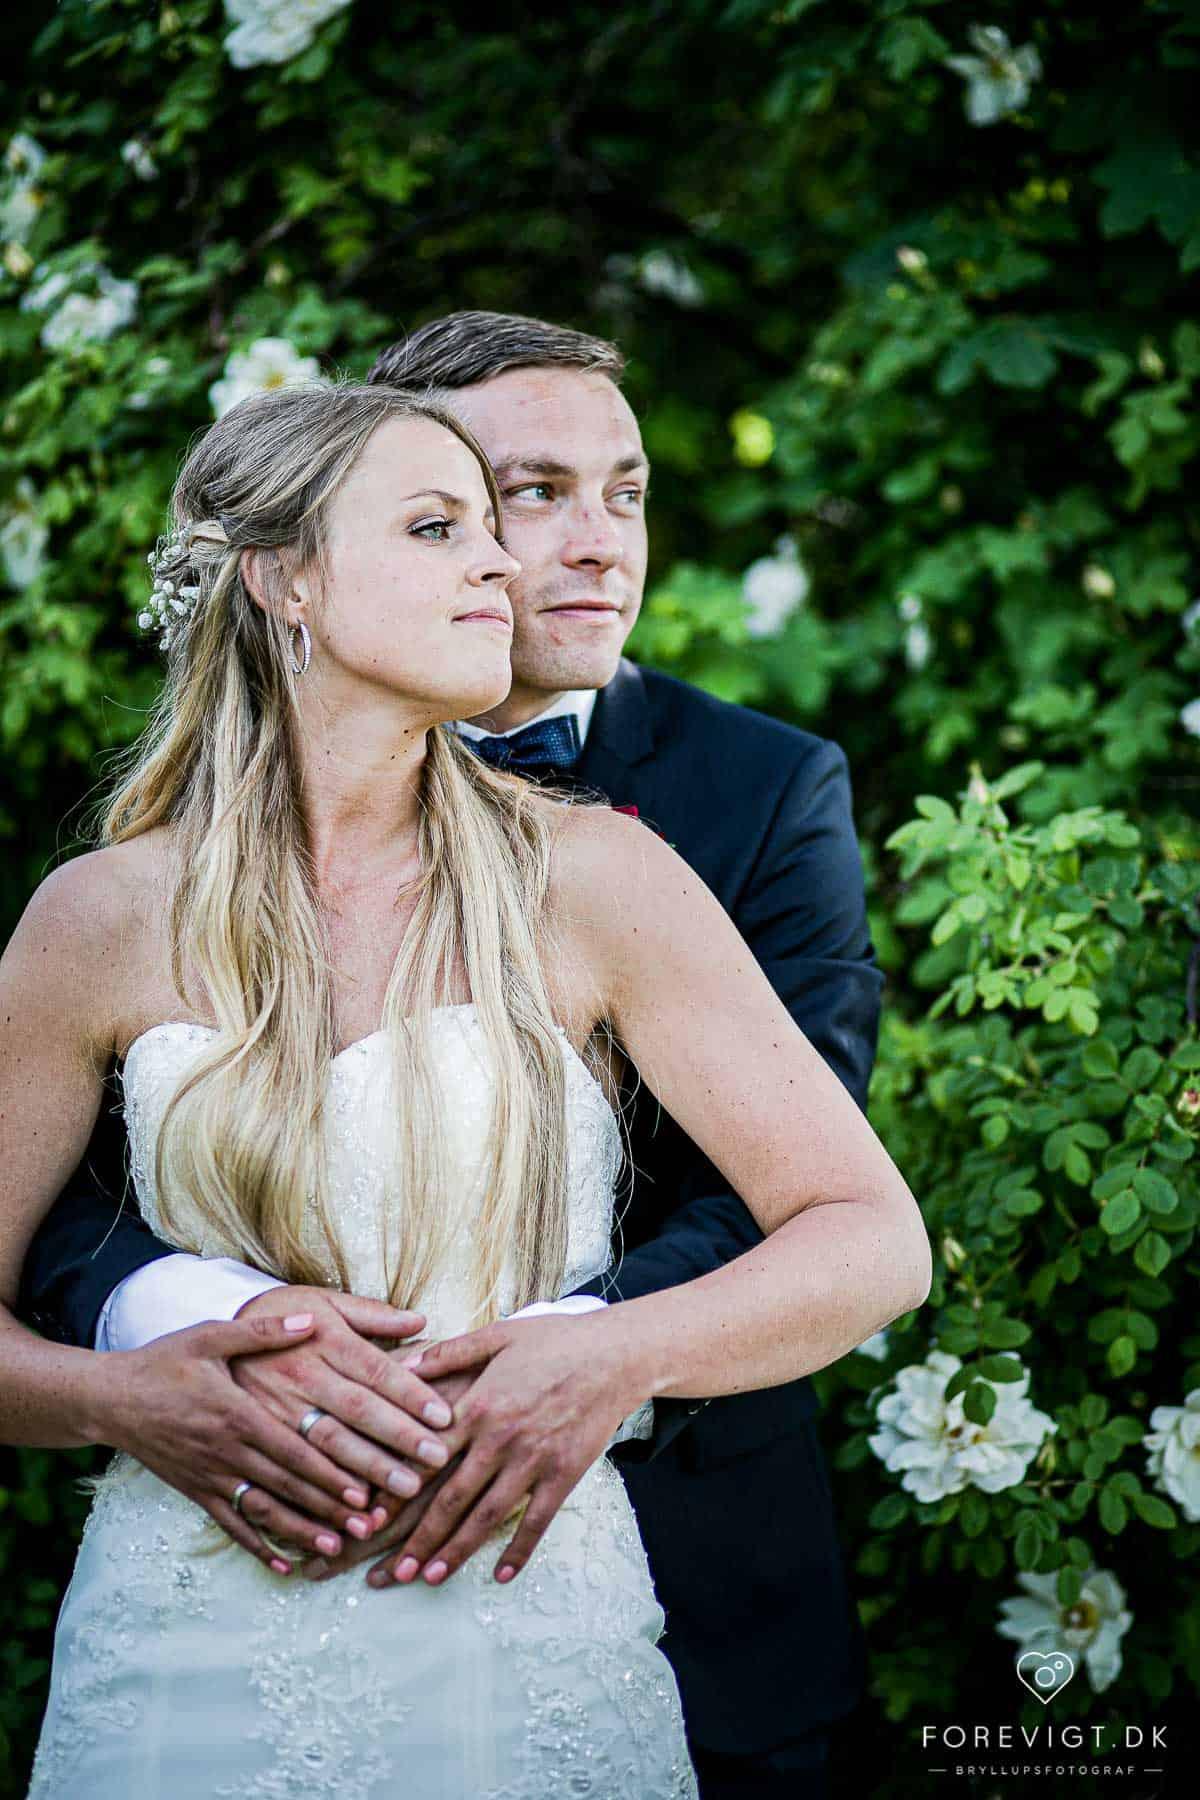 Bryllup på Sjælland - Bryllupsfotograf | Bryllups foto | Fotograf ...